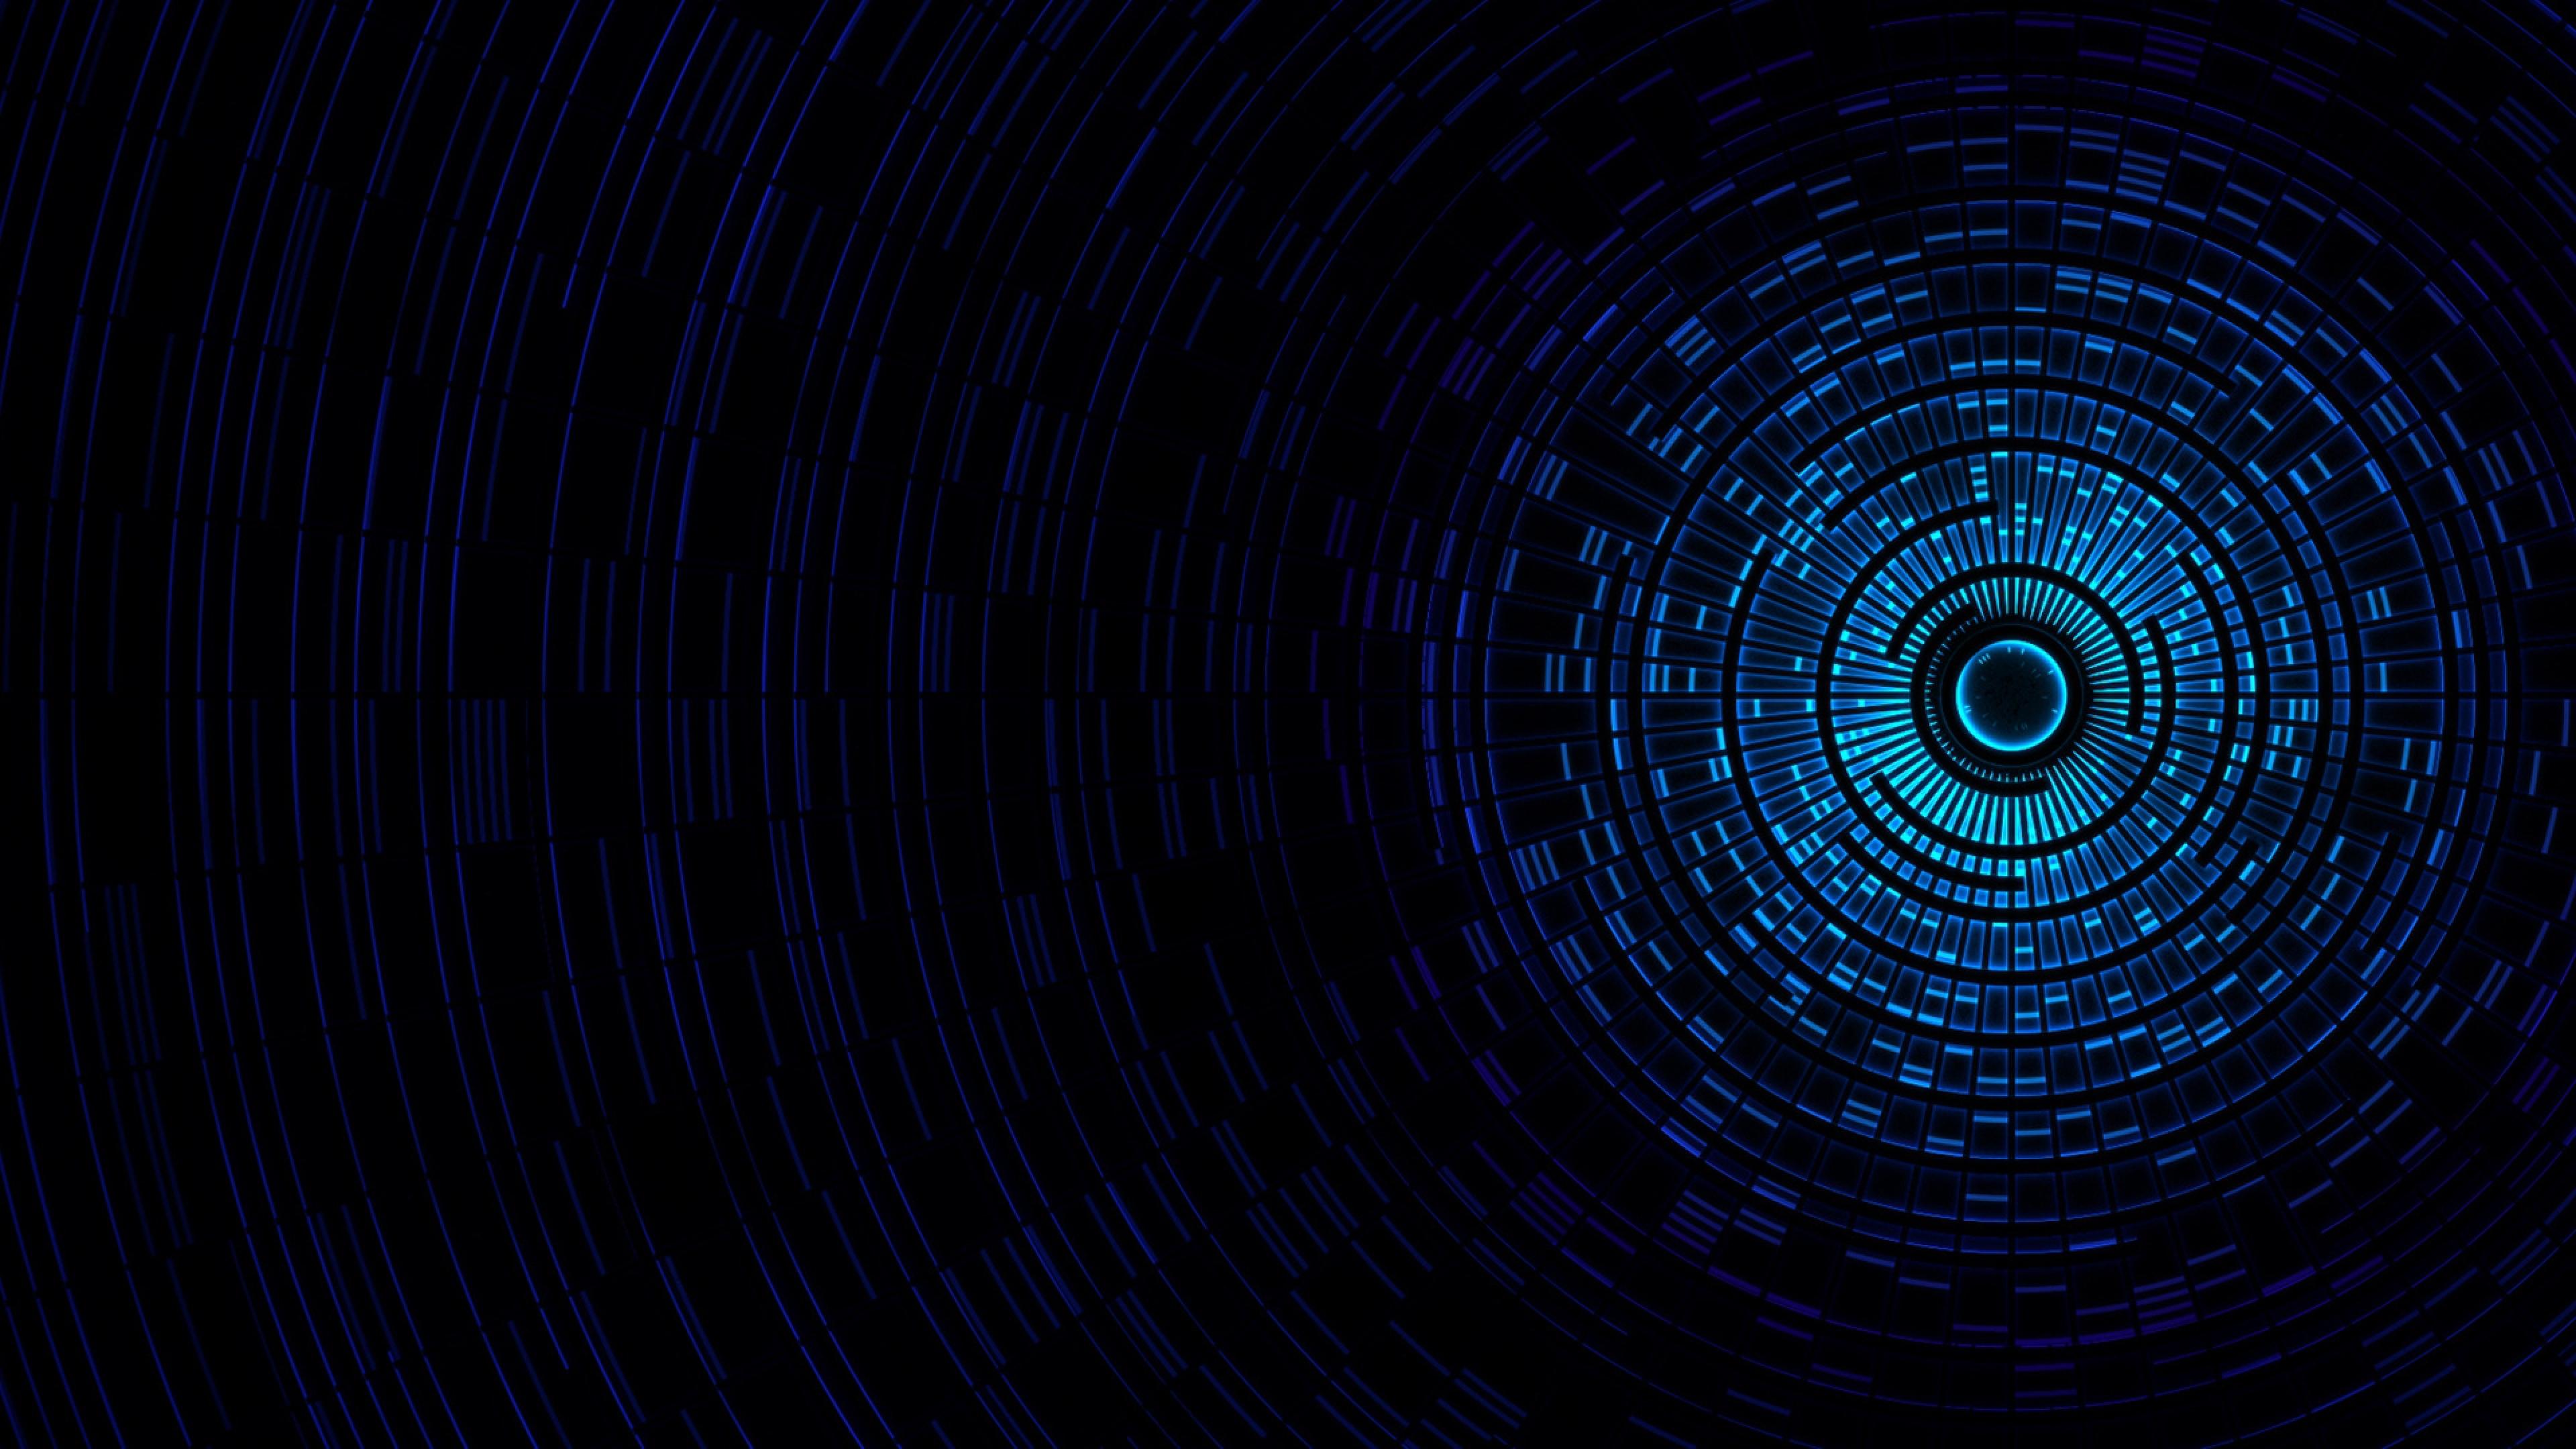 Passage Light Black Blue Wallpaper Background 4K Ultra HD 3840x2160